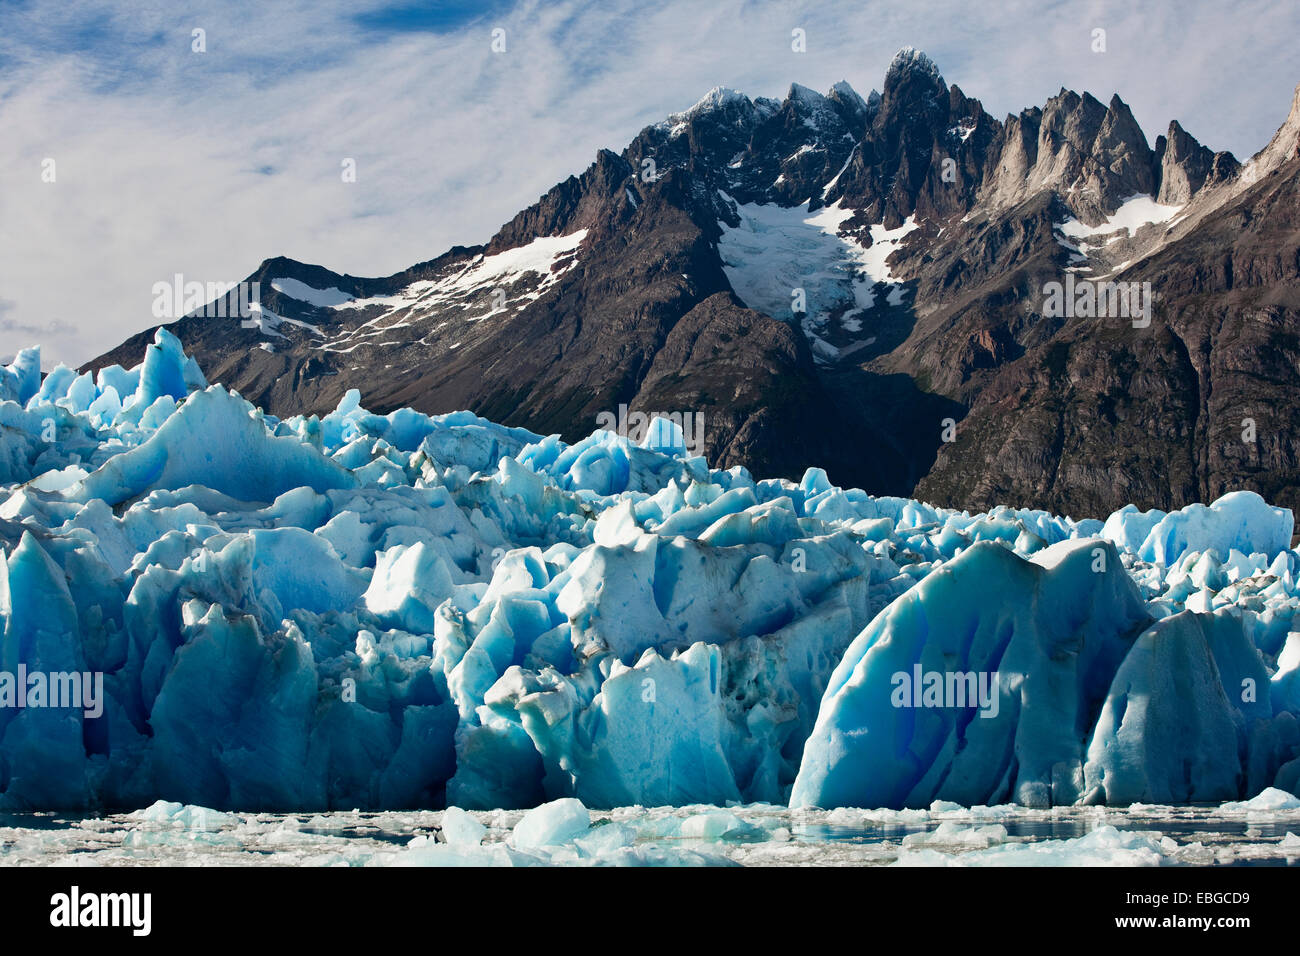 Grey Glacier, icefall, glacier terminus, Torres del Paine National Park, Chile - Stock Image